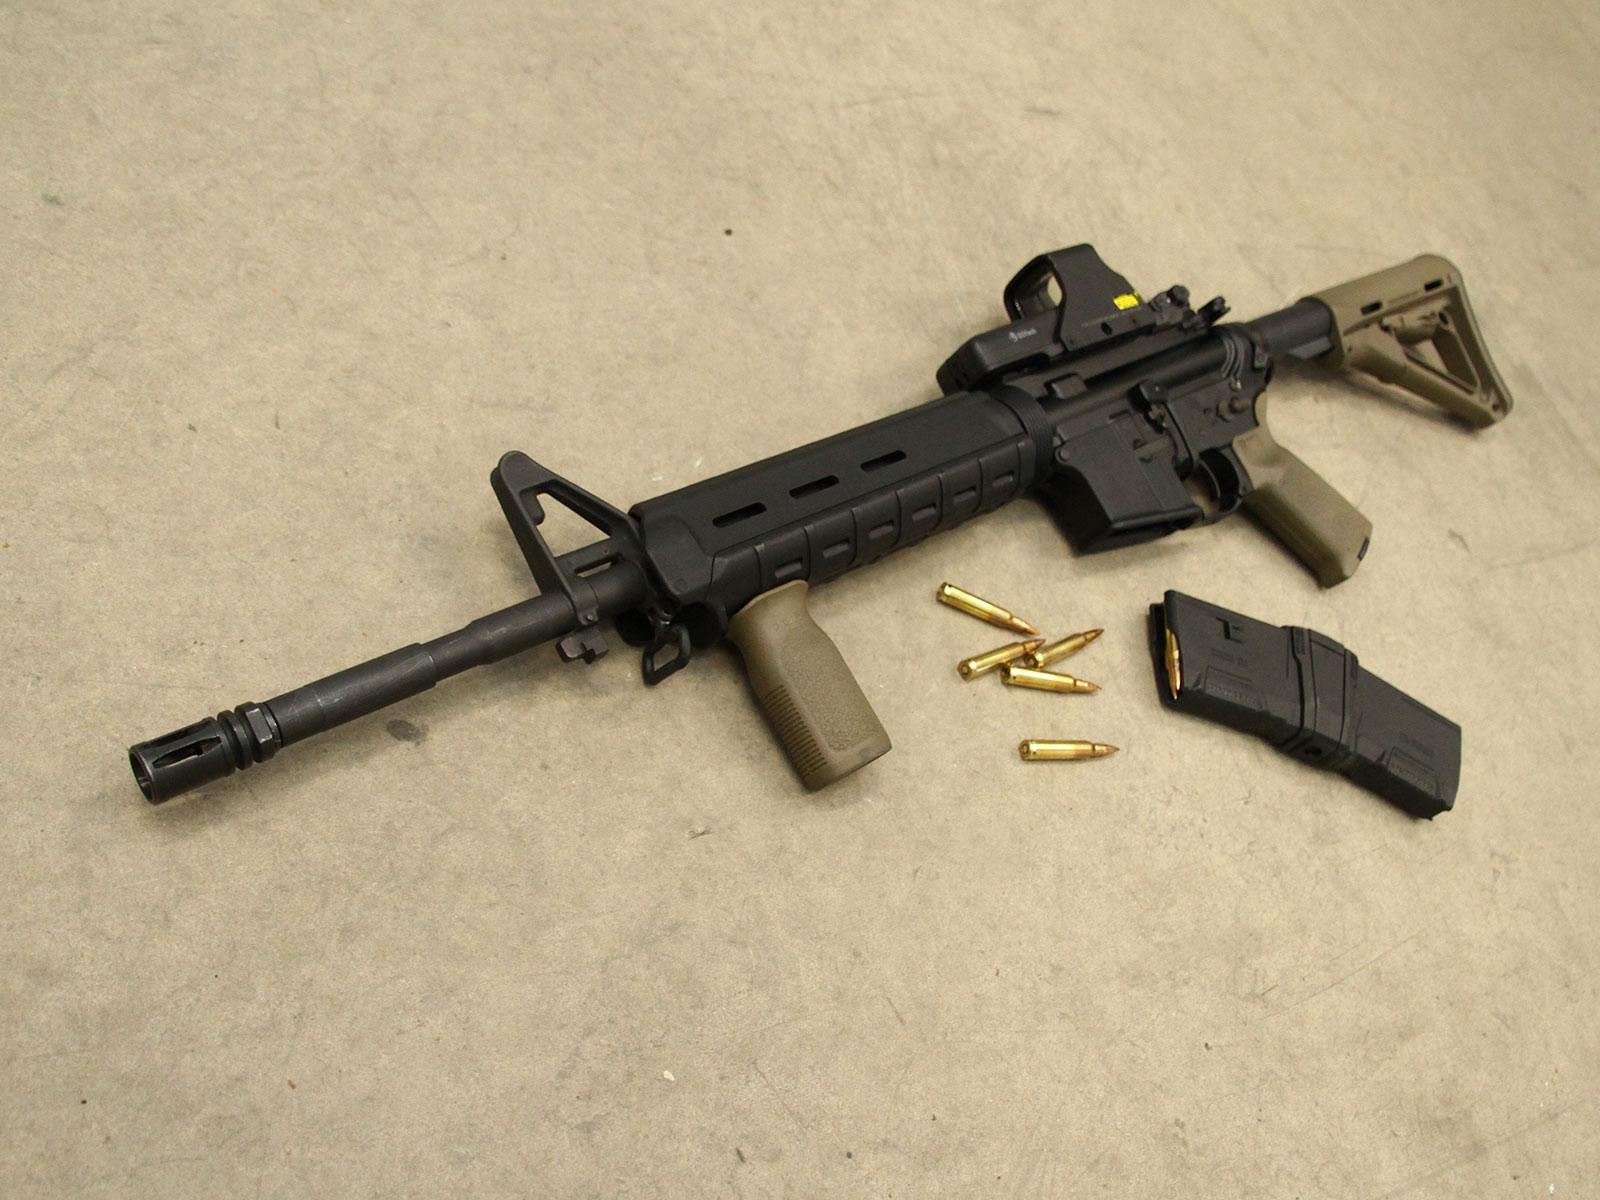 SH_Web_Wir_Waffen_Sabre-Defence1_1600x1200